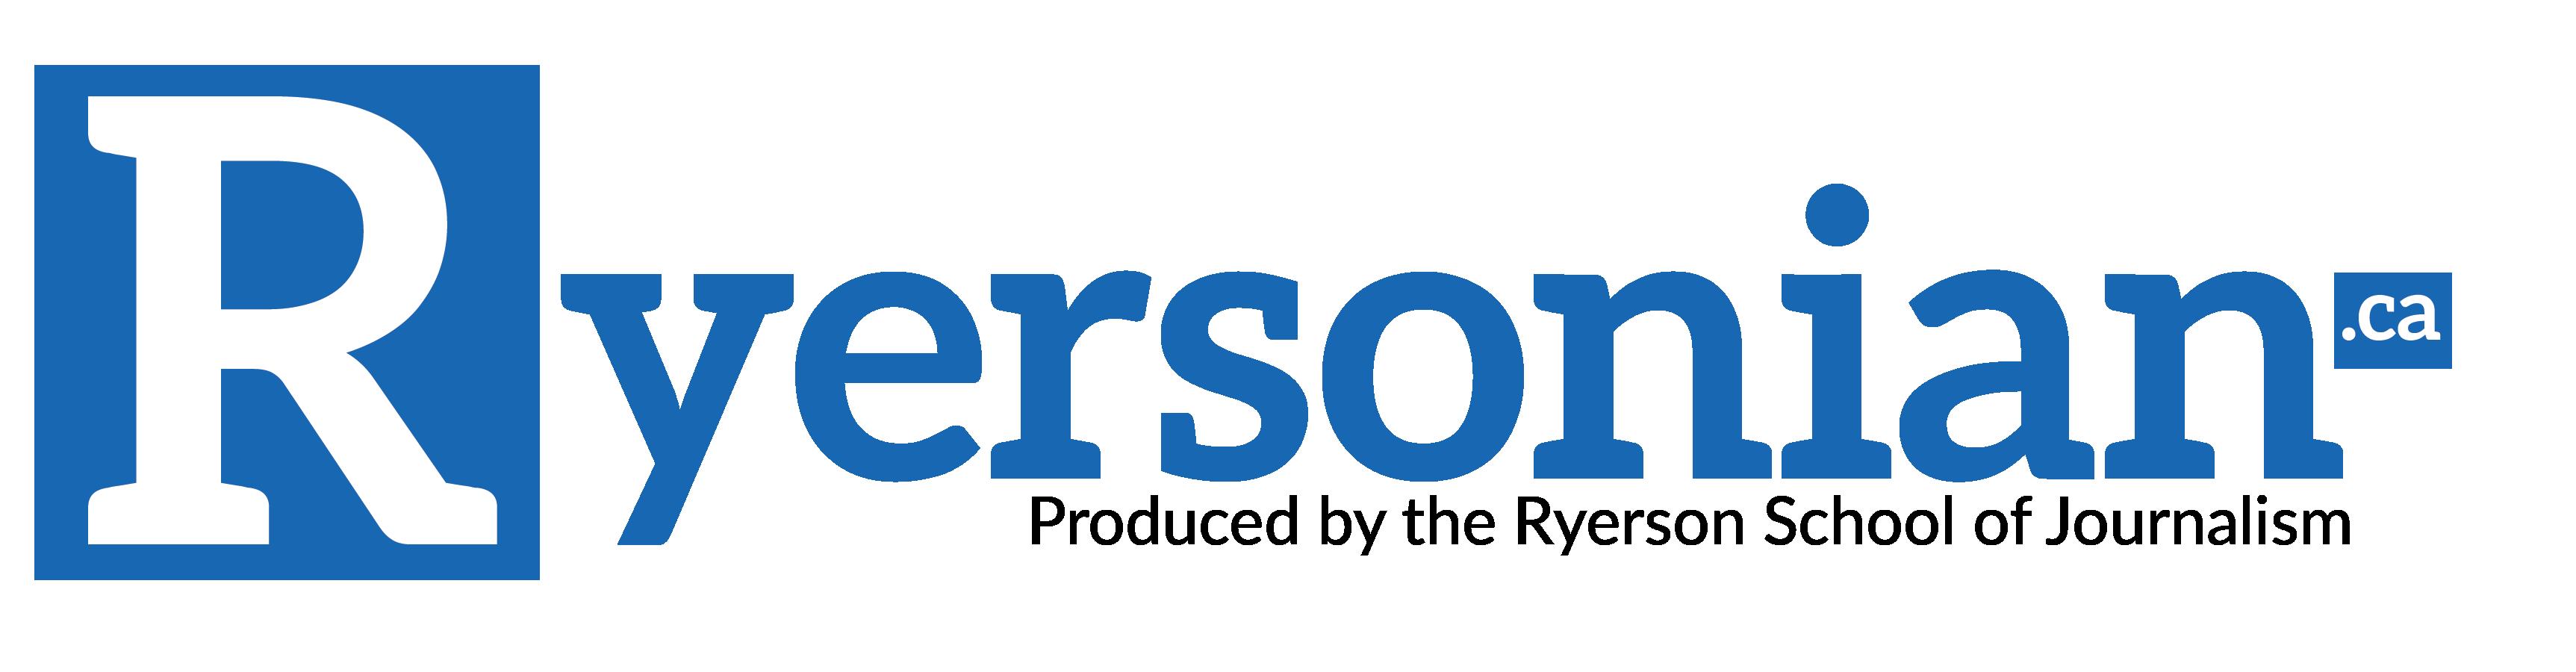 Ryersonian.ca.